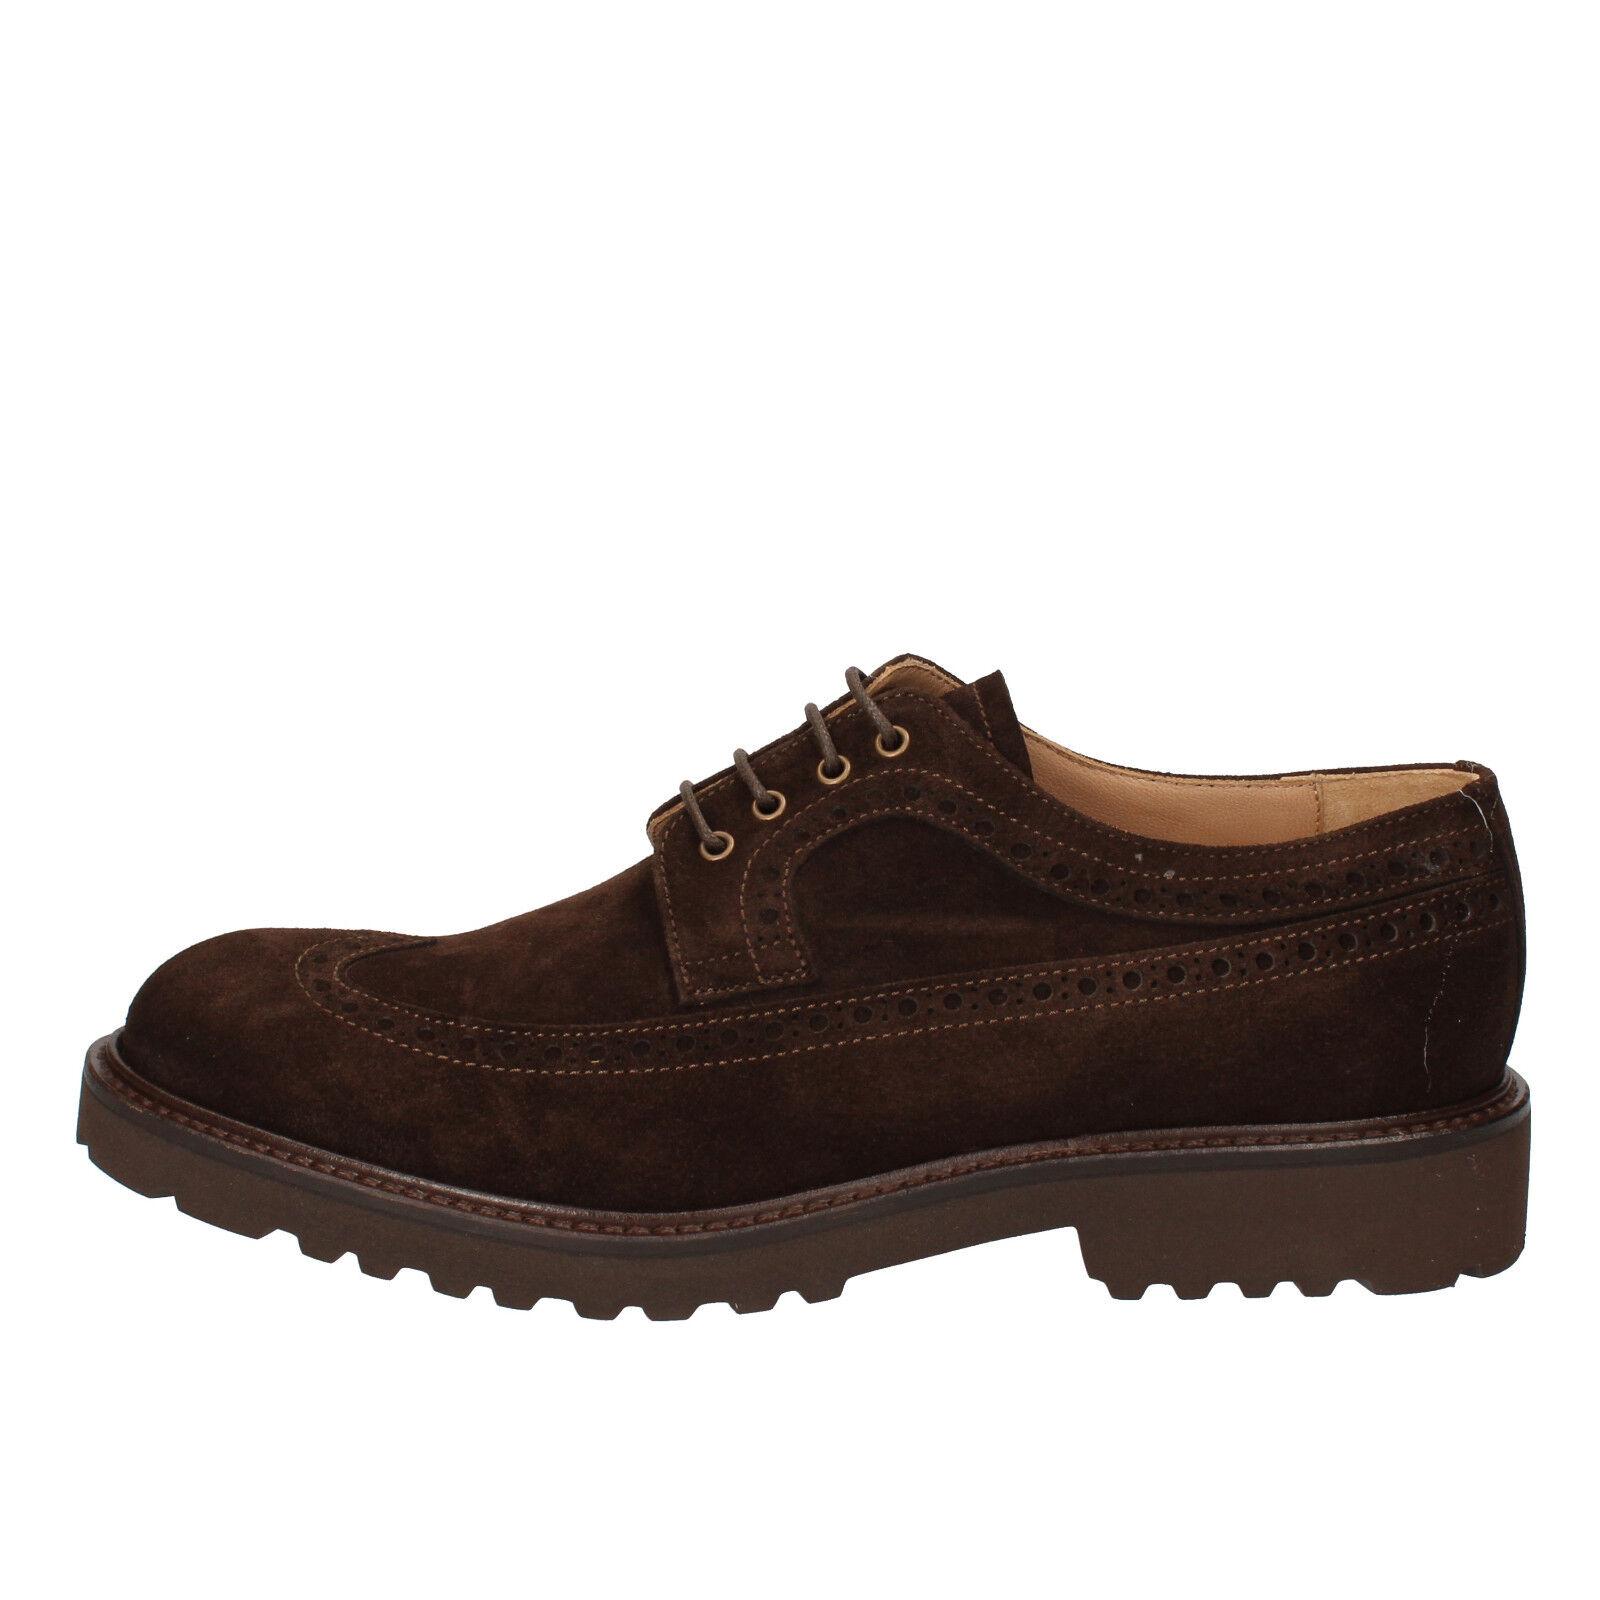 Mens shoes EVOLUZION 5 (EU 39) elegant   oxford-shoes brown suede AD261-B